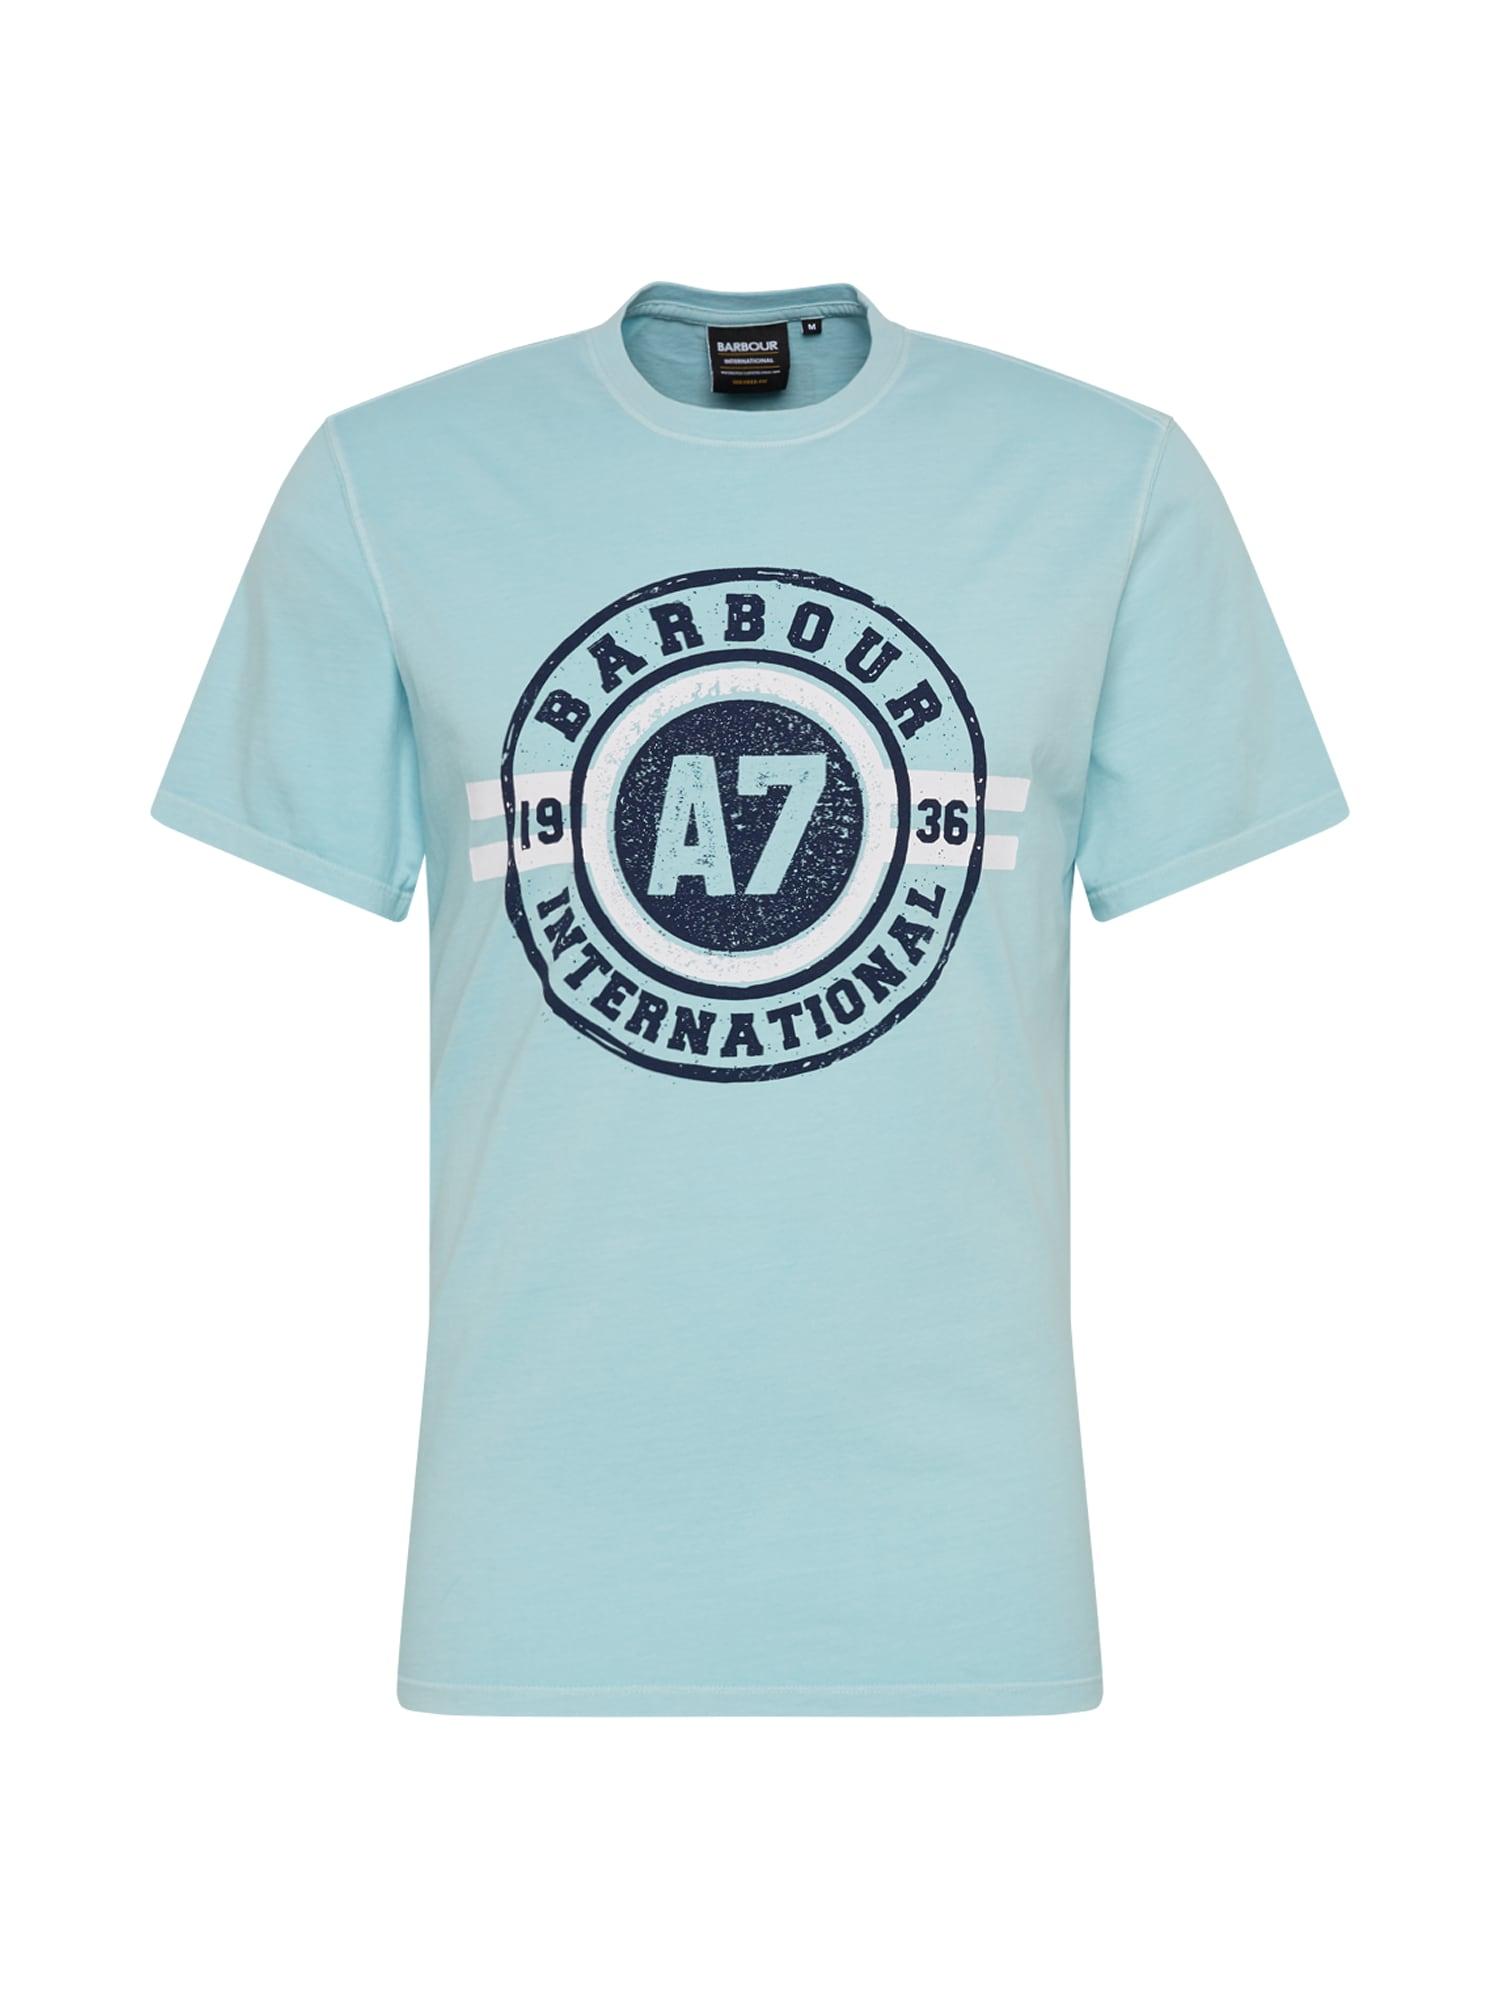 Barbour International Marškinėliai 'B.Intl A7' mėlyna